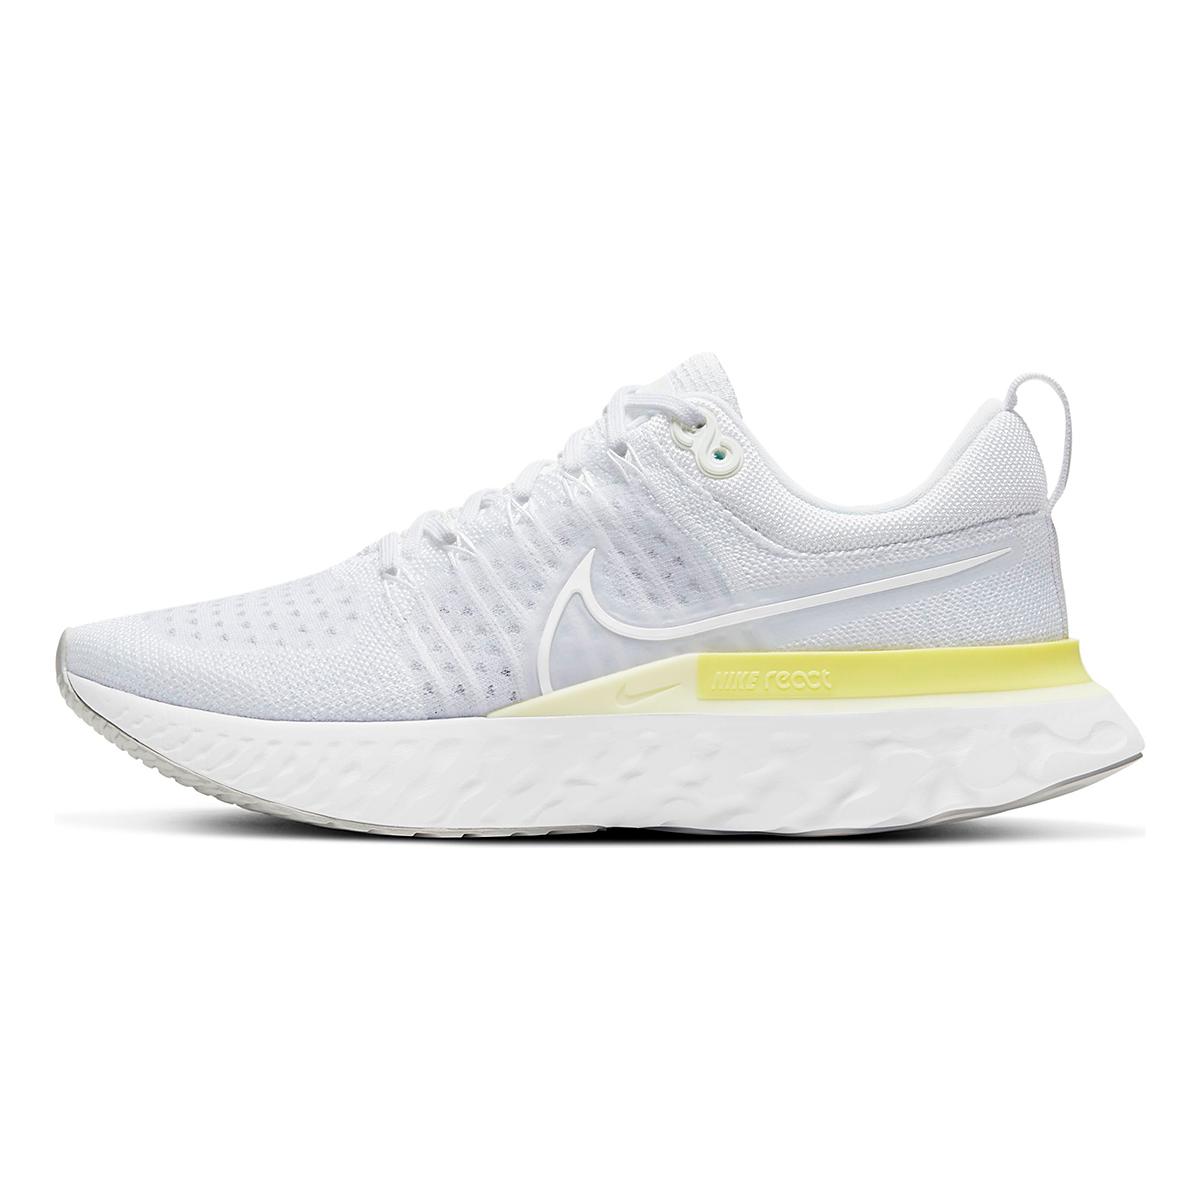 Women's Nike React Infinity Run Flyknit 2 Running Shoe - Color: White/White-Platinum Tint/Light Zitron - Size: 5 - Width: Regular, White/White-Platinum Tint/Light Zitron, large, image 2